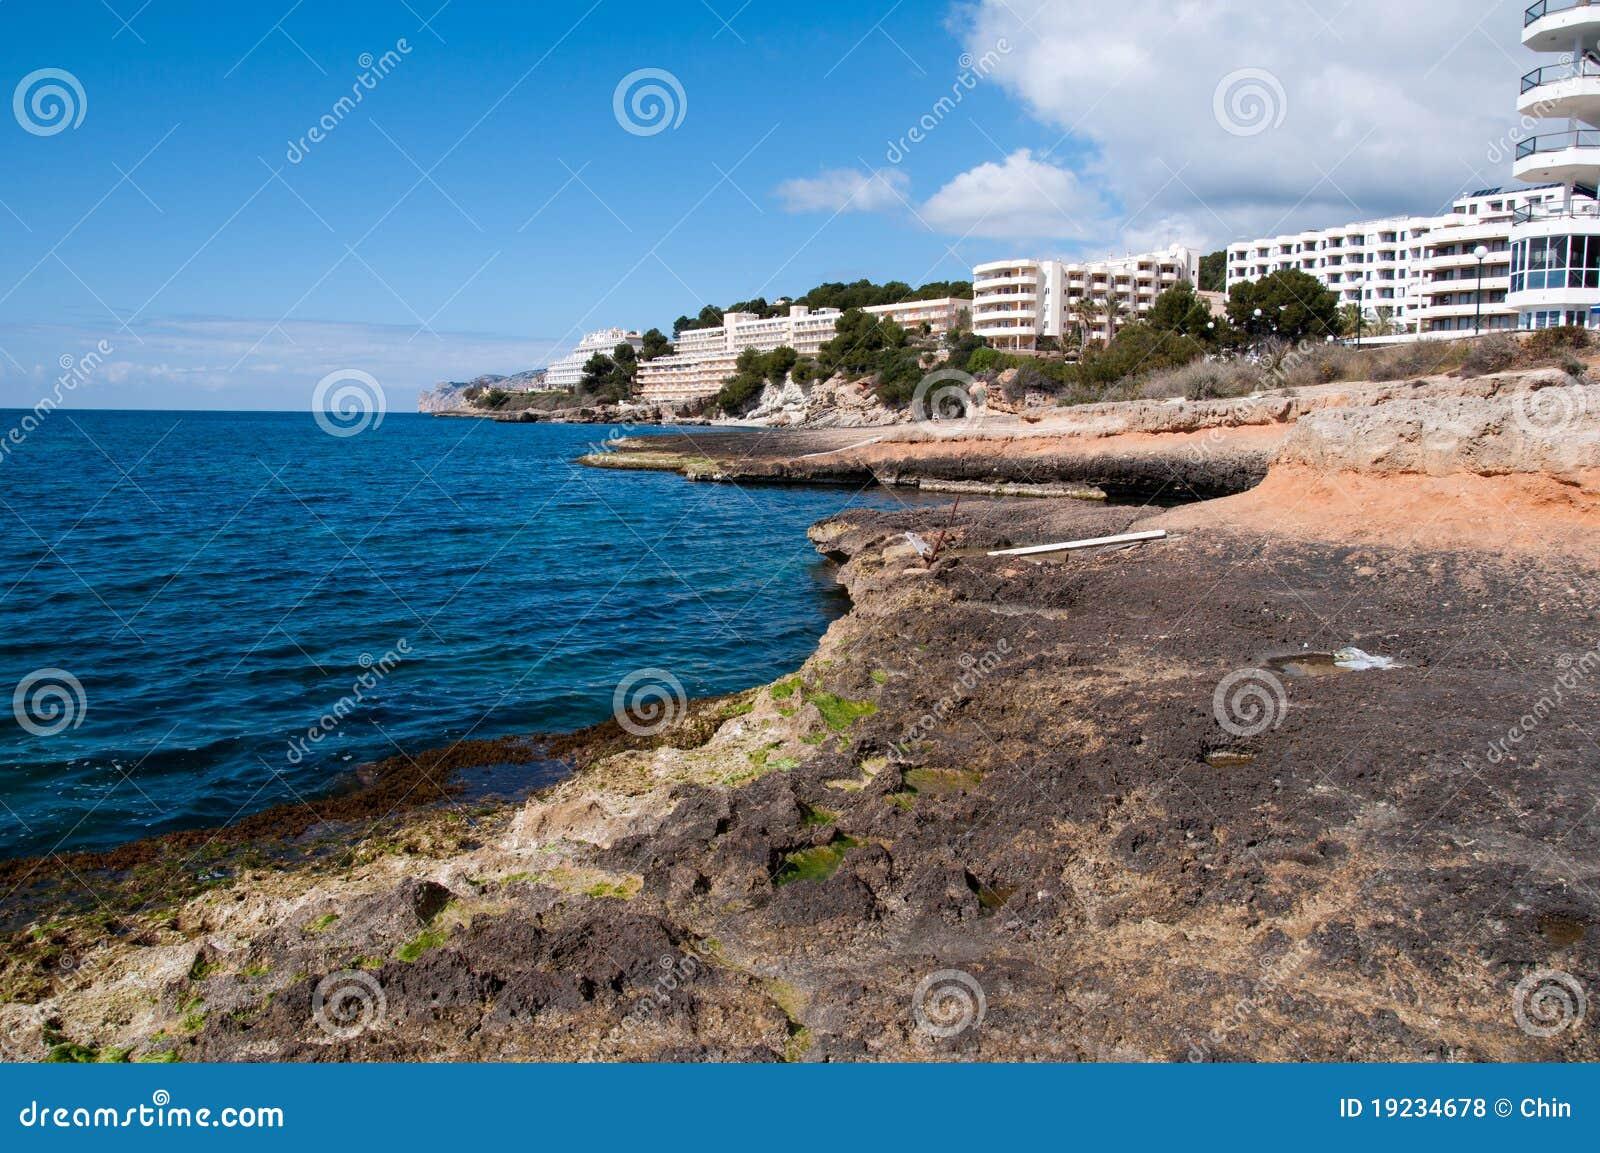 Hotels van Kerstman Ponsa, Majorca, Spanje